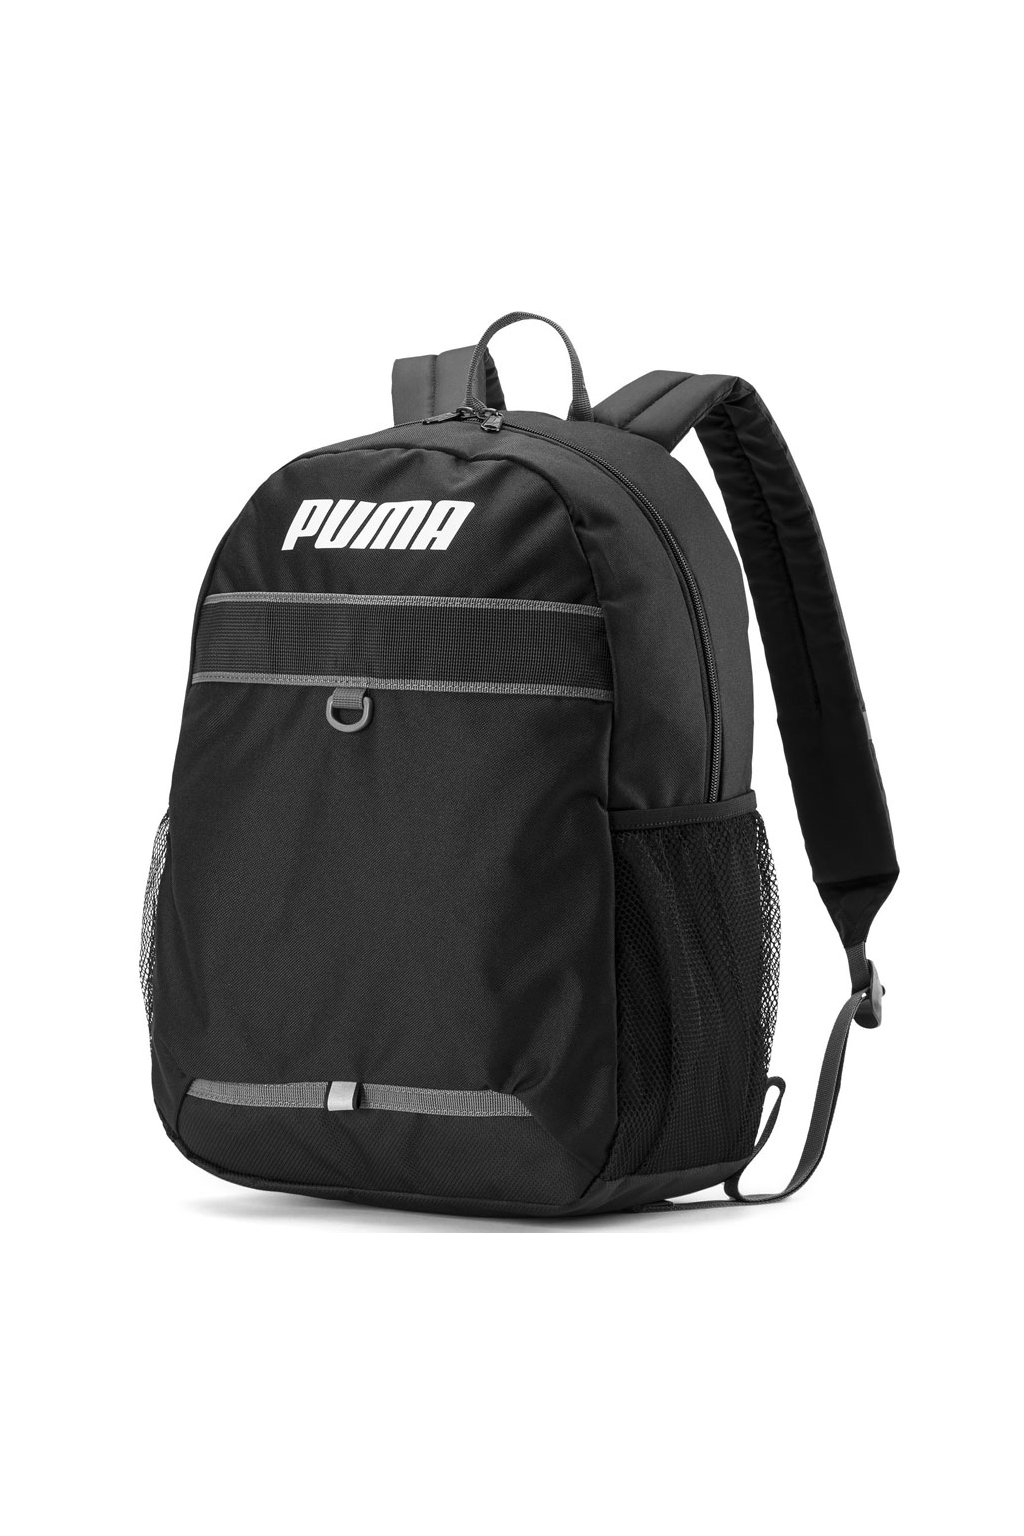 Batoh Puma Plus Backpack 076724 01 čierny 23L